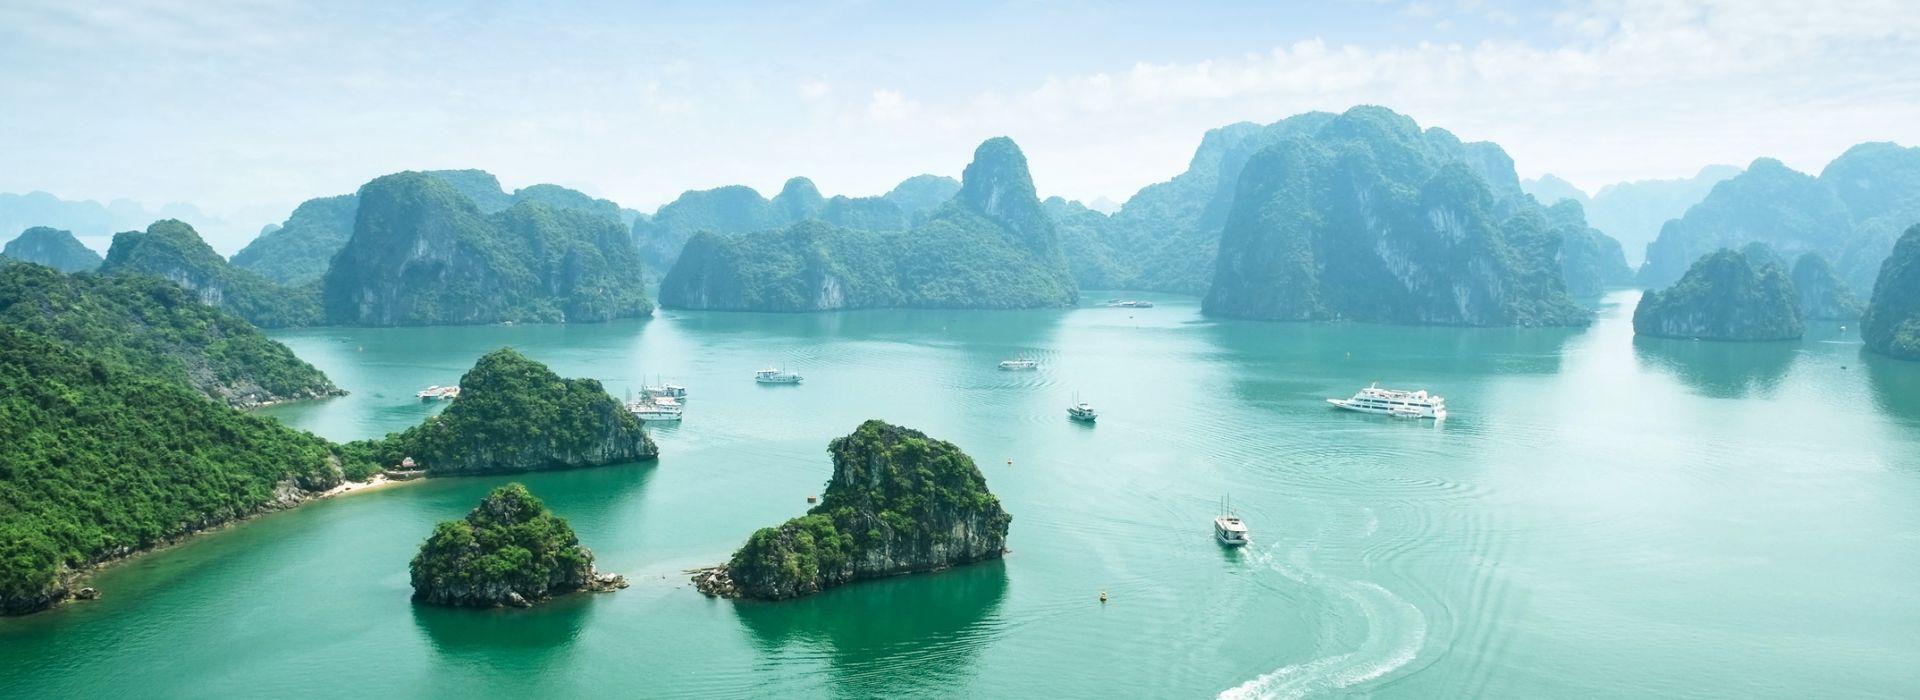 Adventure Tours in Ha Long Bay